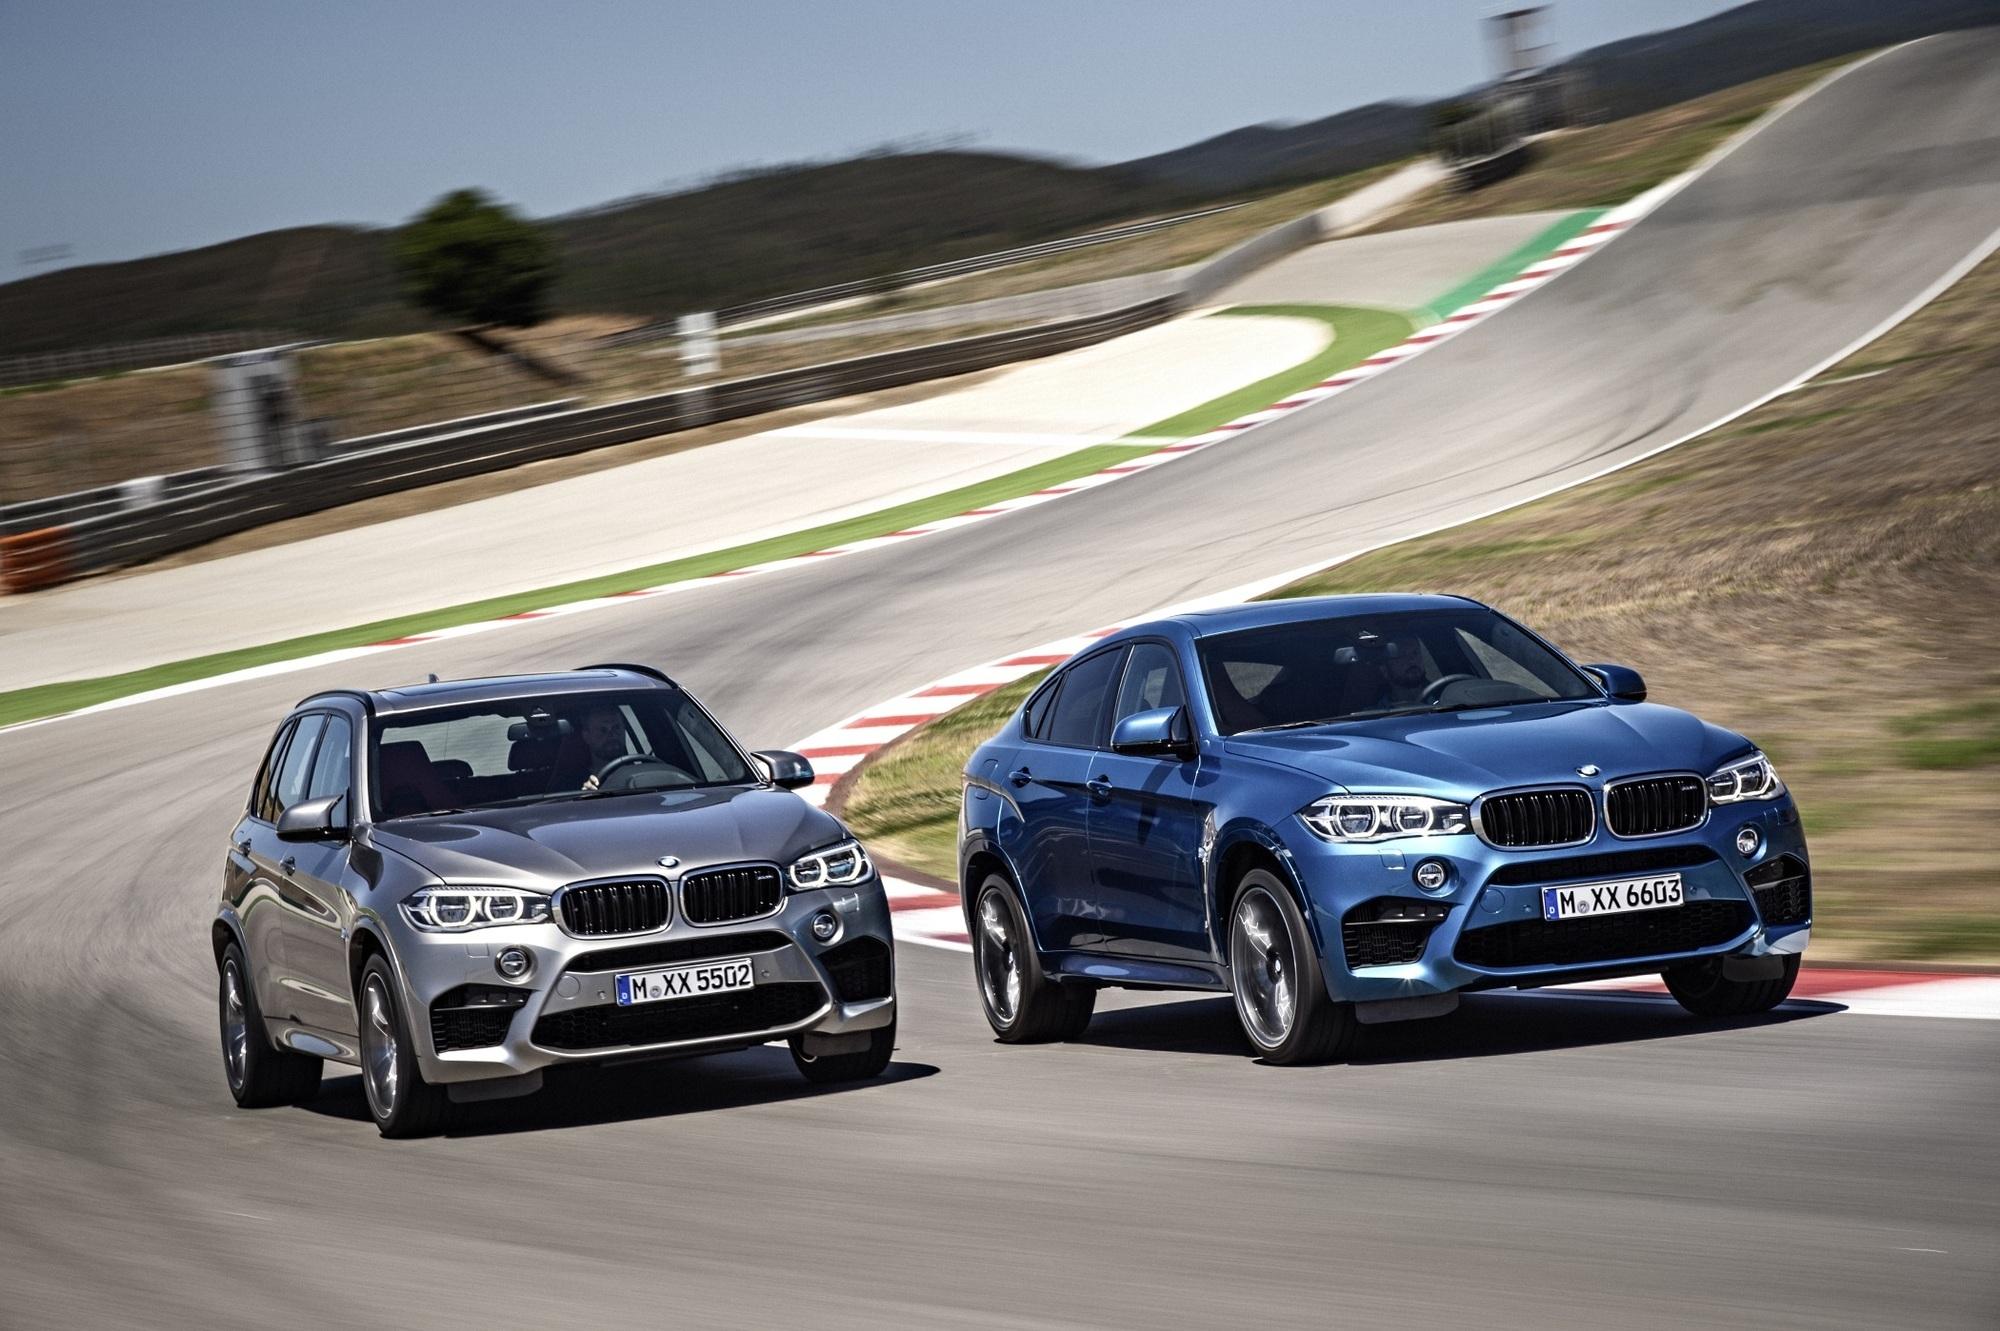 BMW X5 M und X6 M - Zwei Kraftprotze im Tiefflug